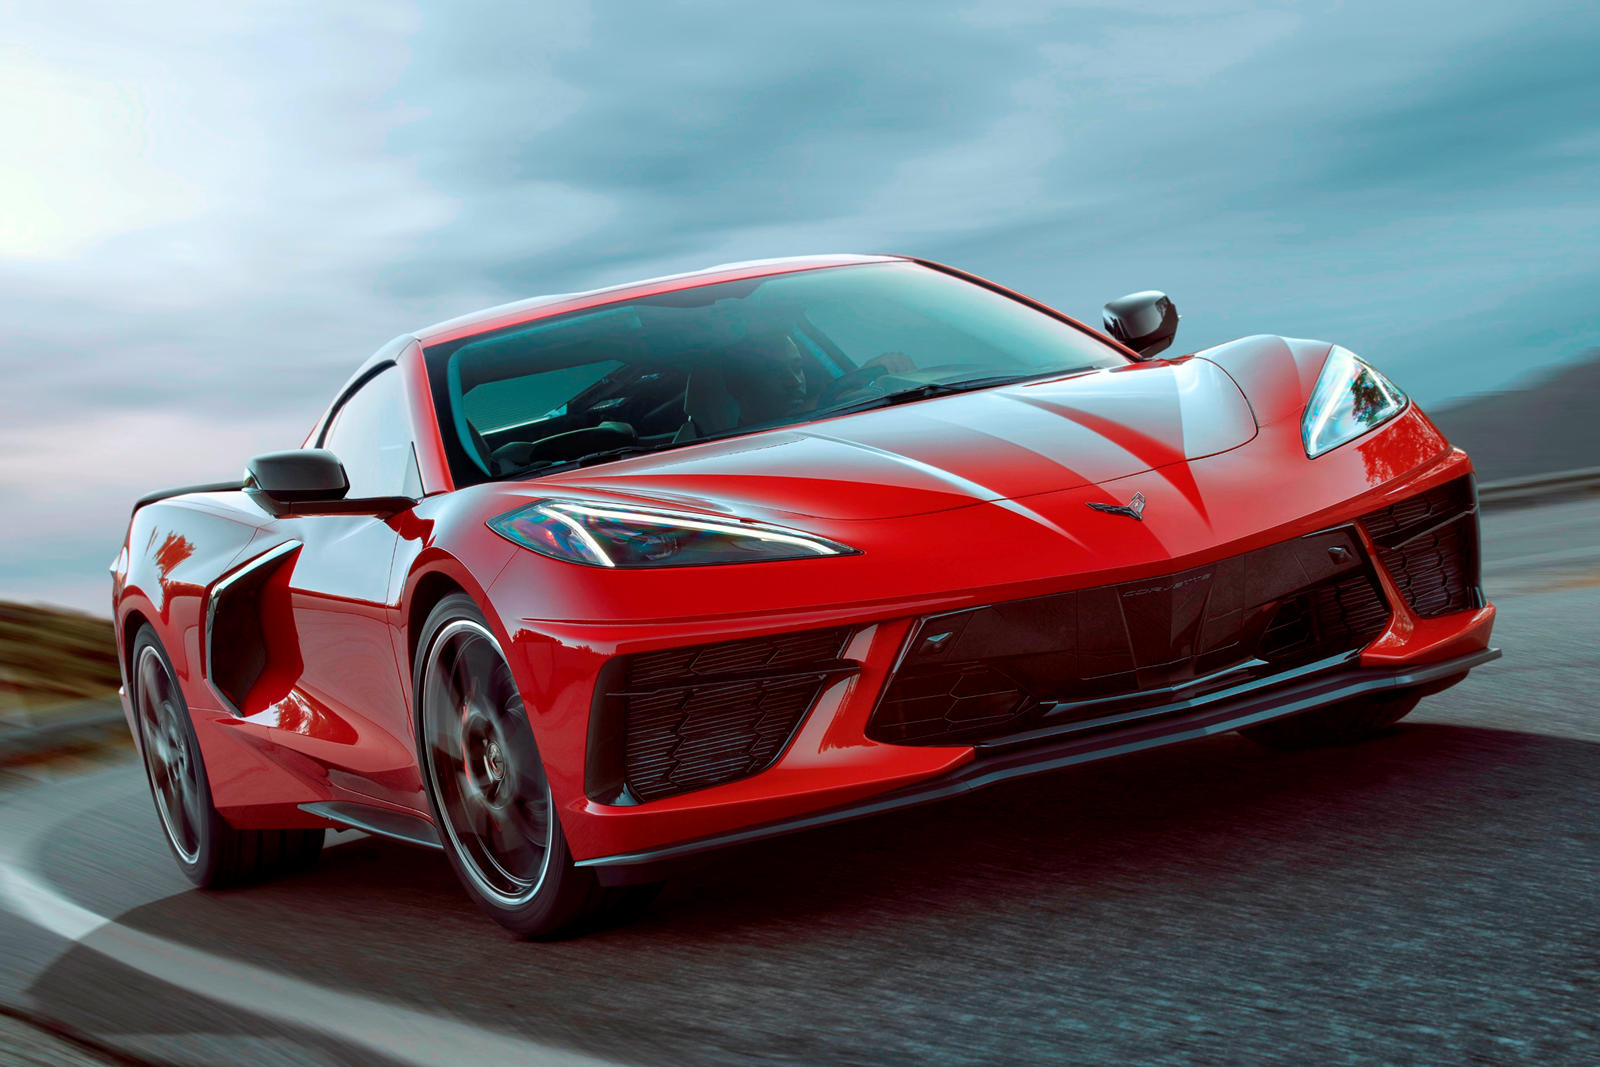 More 2020 Chevy Corvette Options Secrets Exposed